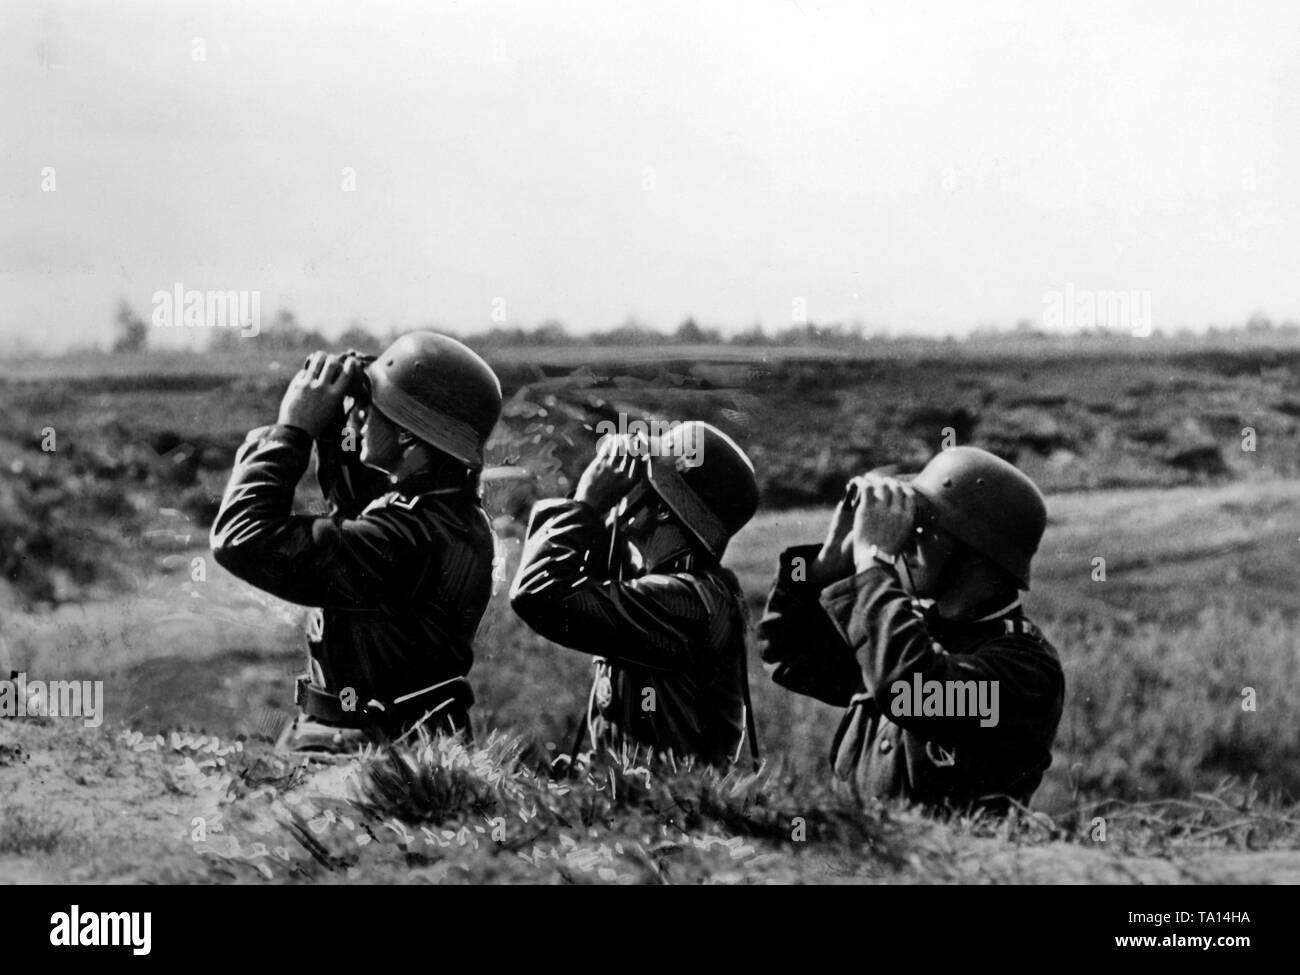 Infantrymen observe the Luftwaffe with binoculars during their deployment southeast of Lake Ilmen. Photo of the Propaganda Company (PK): war correspondent Etzold. - Stock Image